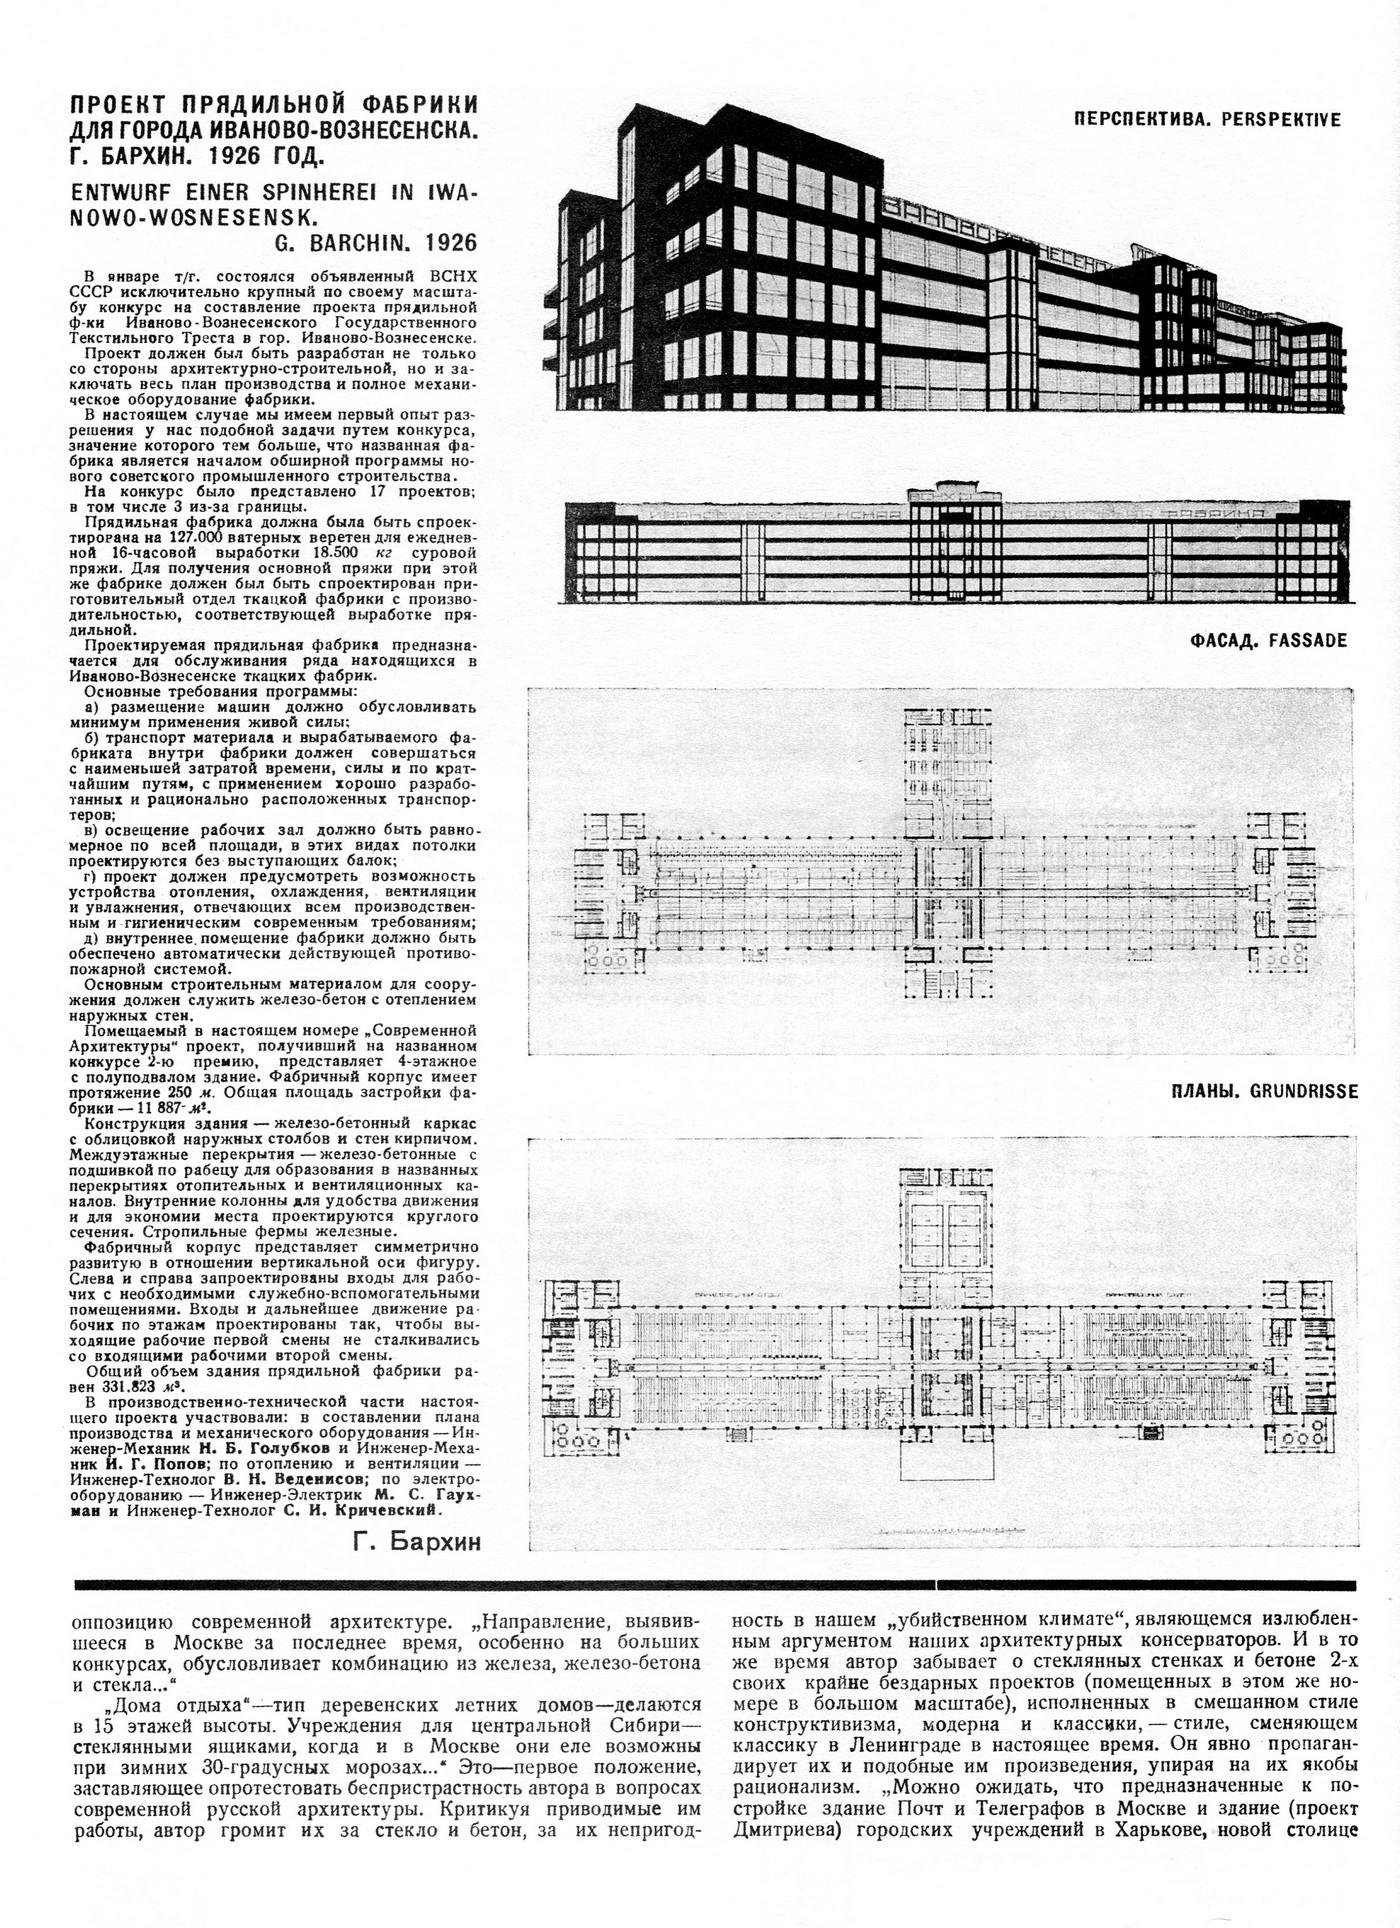 tehne.com-sa-1926-5-6-1400-0018